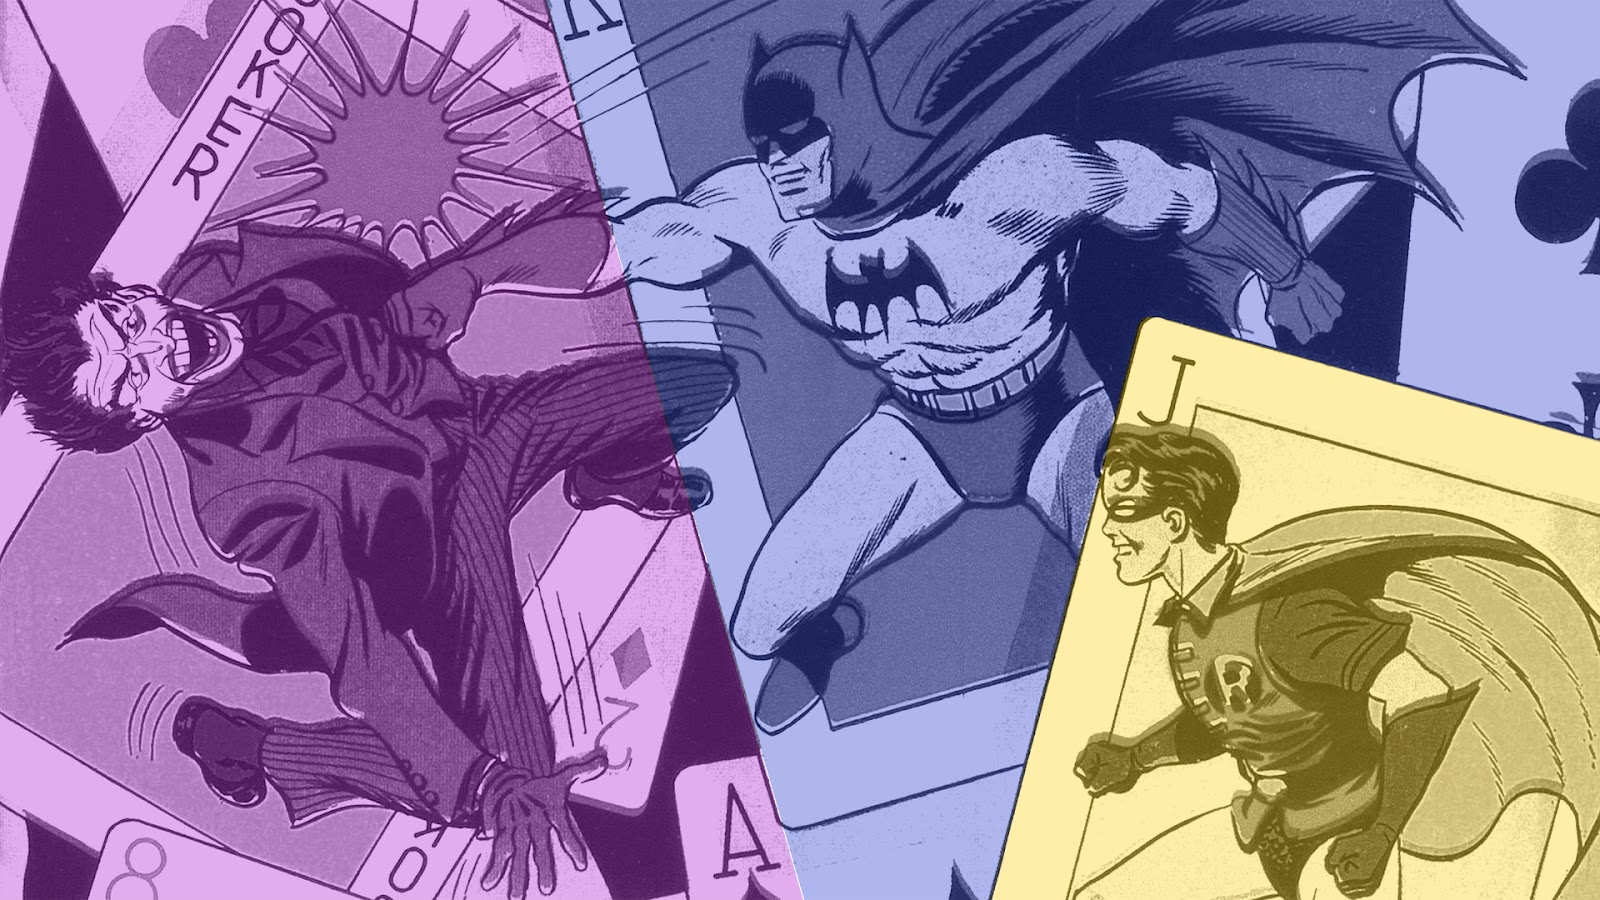 http://3.bp.blogspot.com/-OOwjgiY2vVw/T73Q8RF_lWI/AAAAAAAAMNQ/2LKpAF1mLiM/s1600/Batman+Wallpaper.jpg